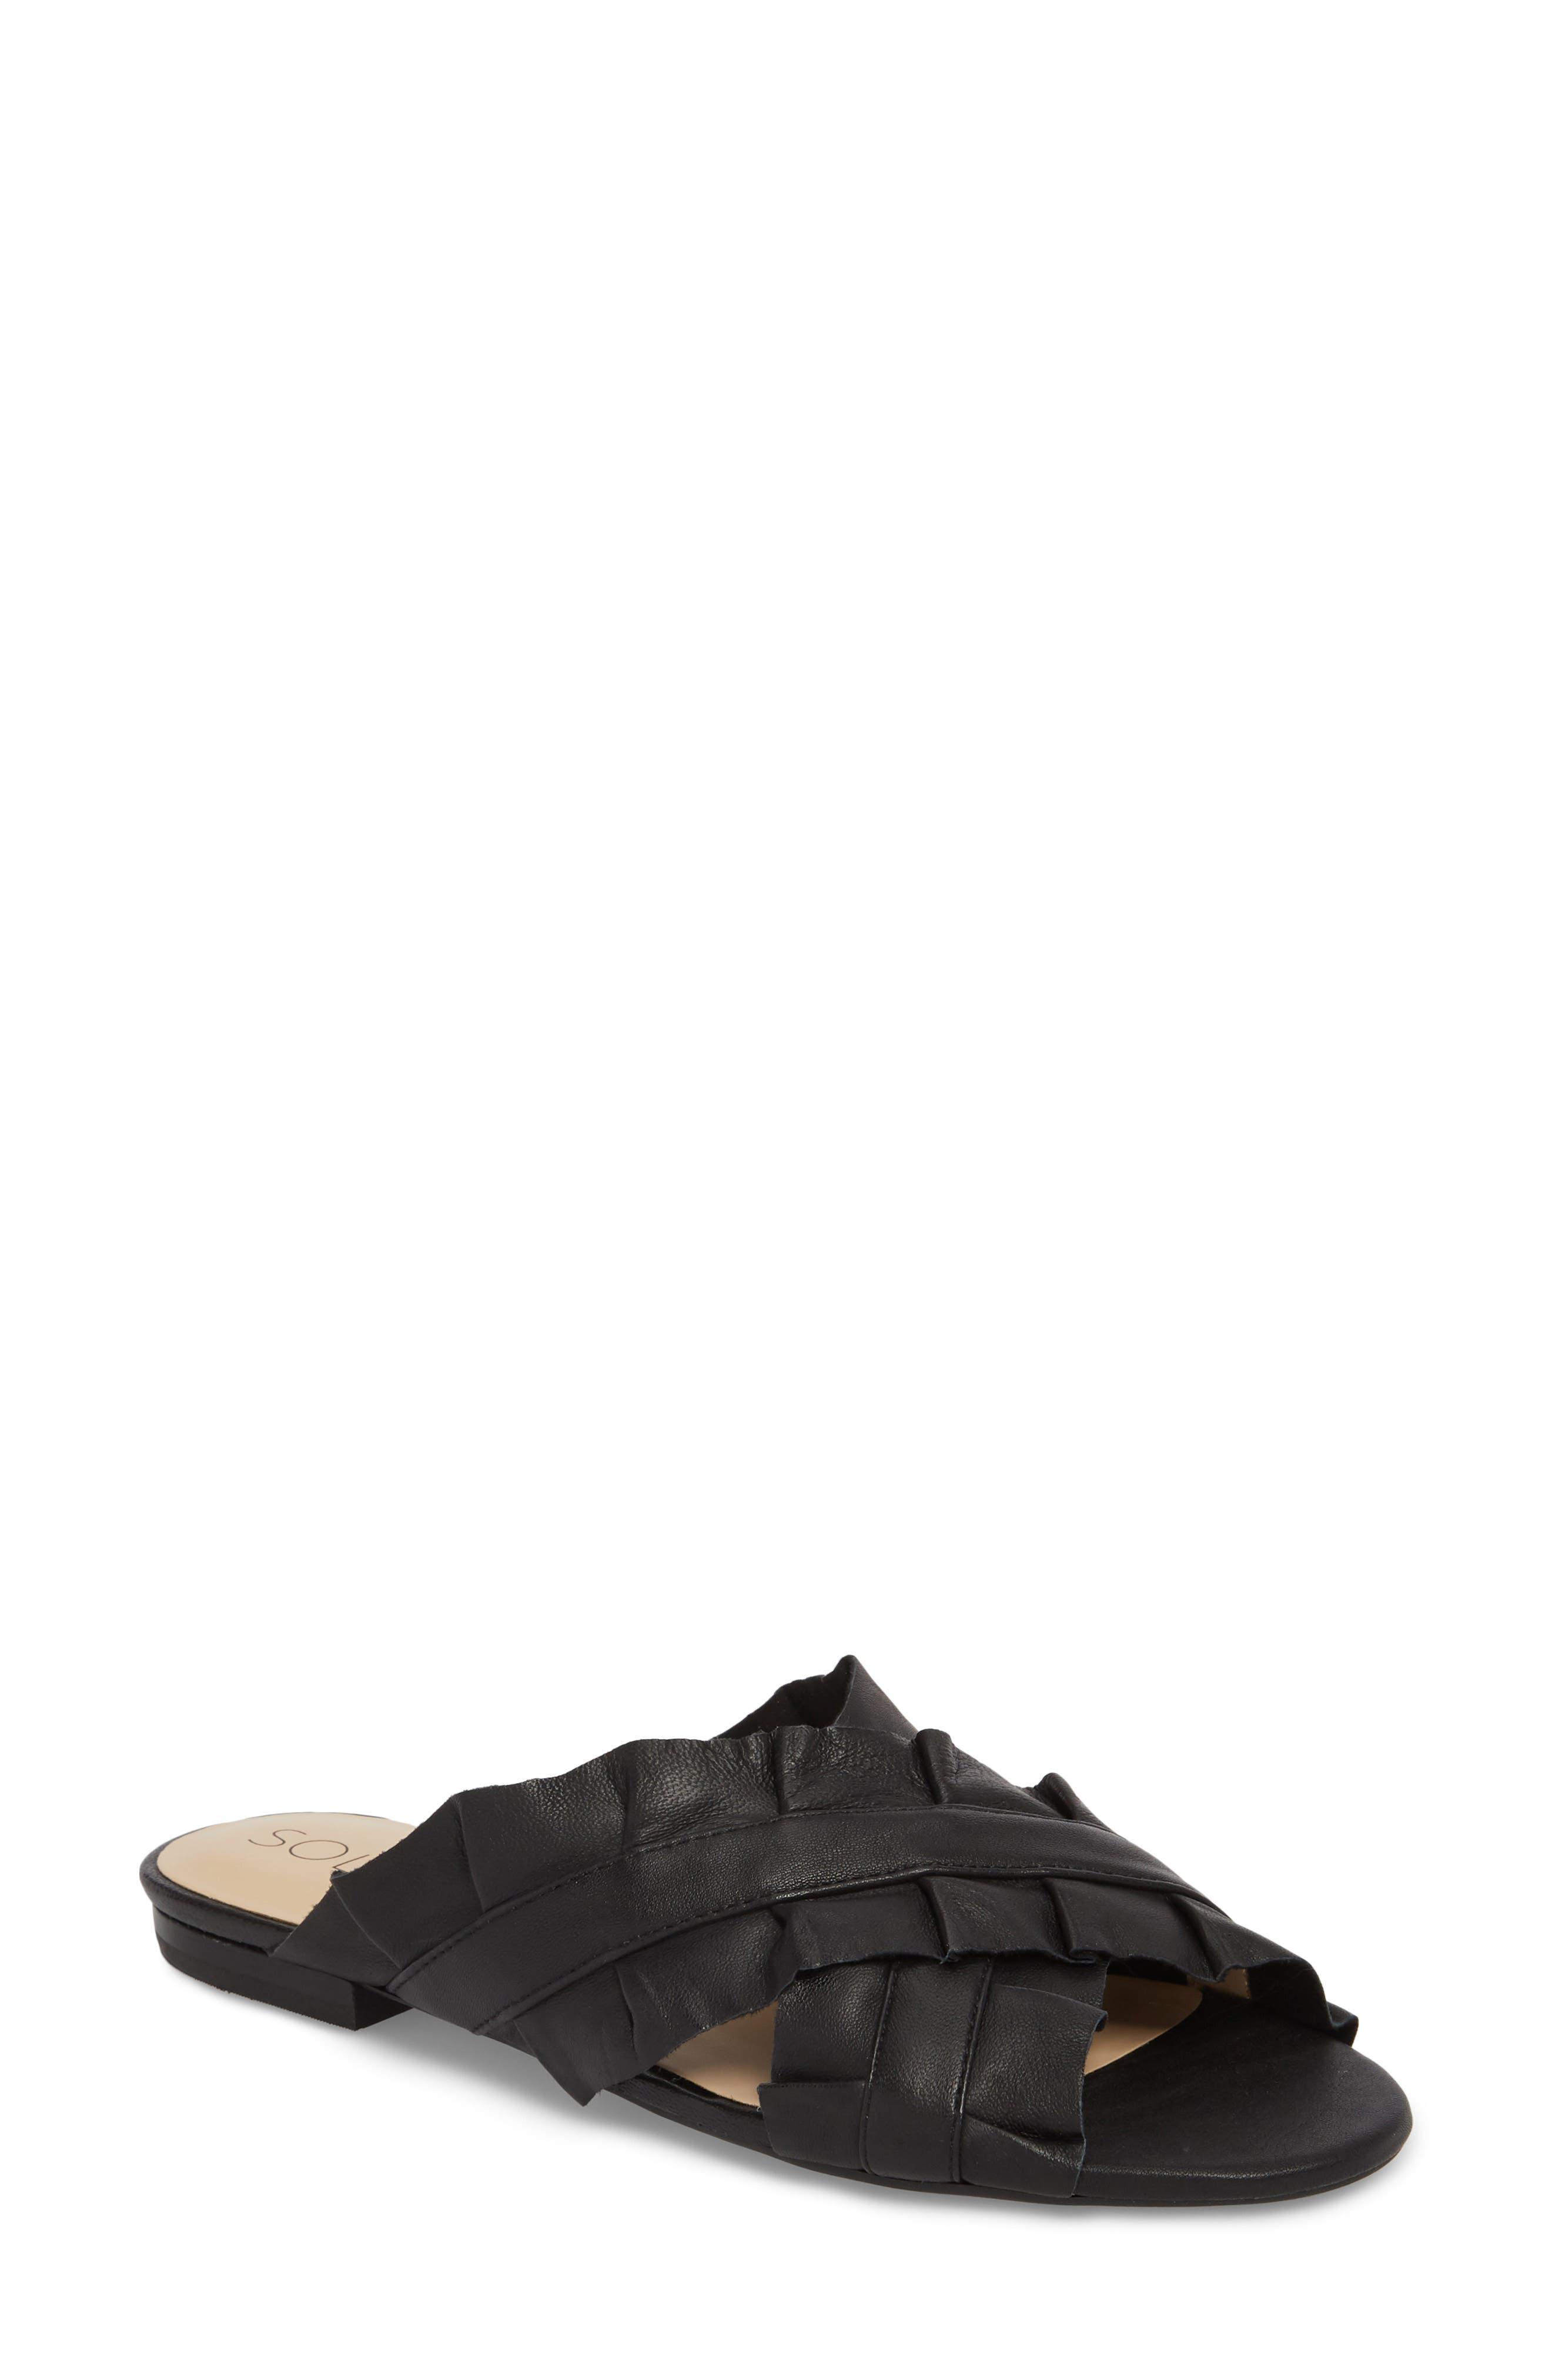 SOLE SOCIETY Mandi Slide Sandal, Main, color, BLACK